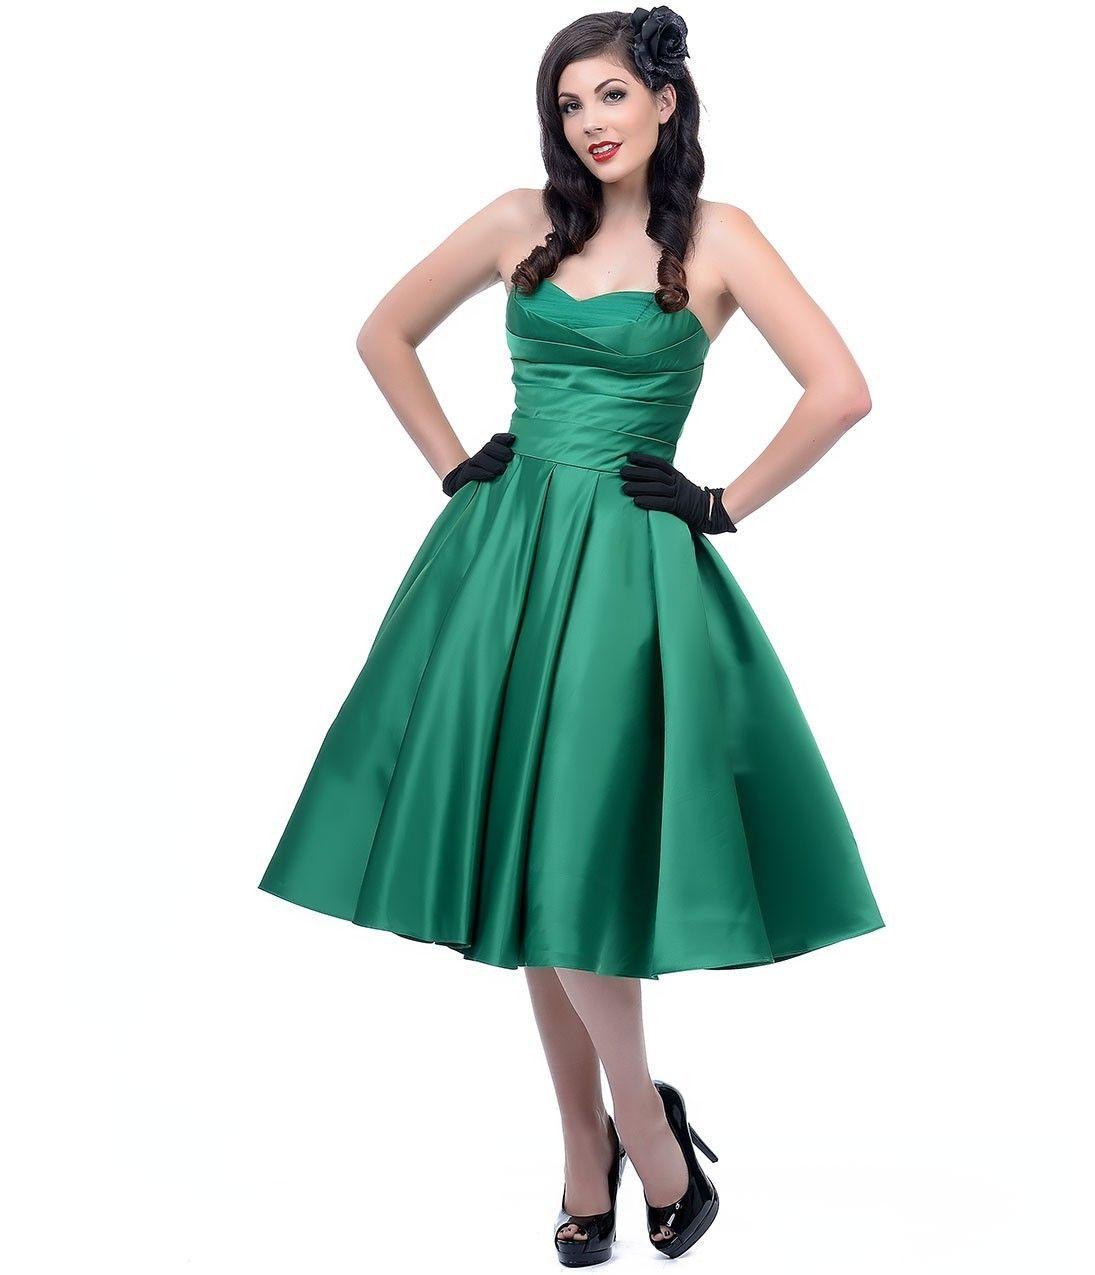 http://www.ebay.com/itm/rare-Unique-Vintage-Emerald-Green-strapless ...